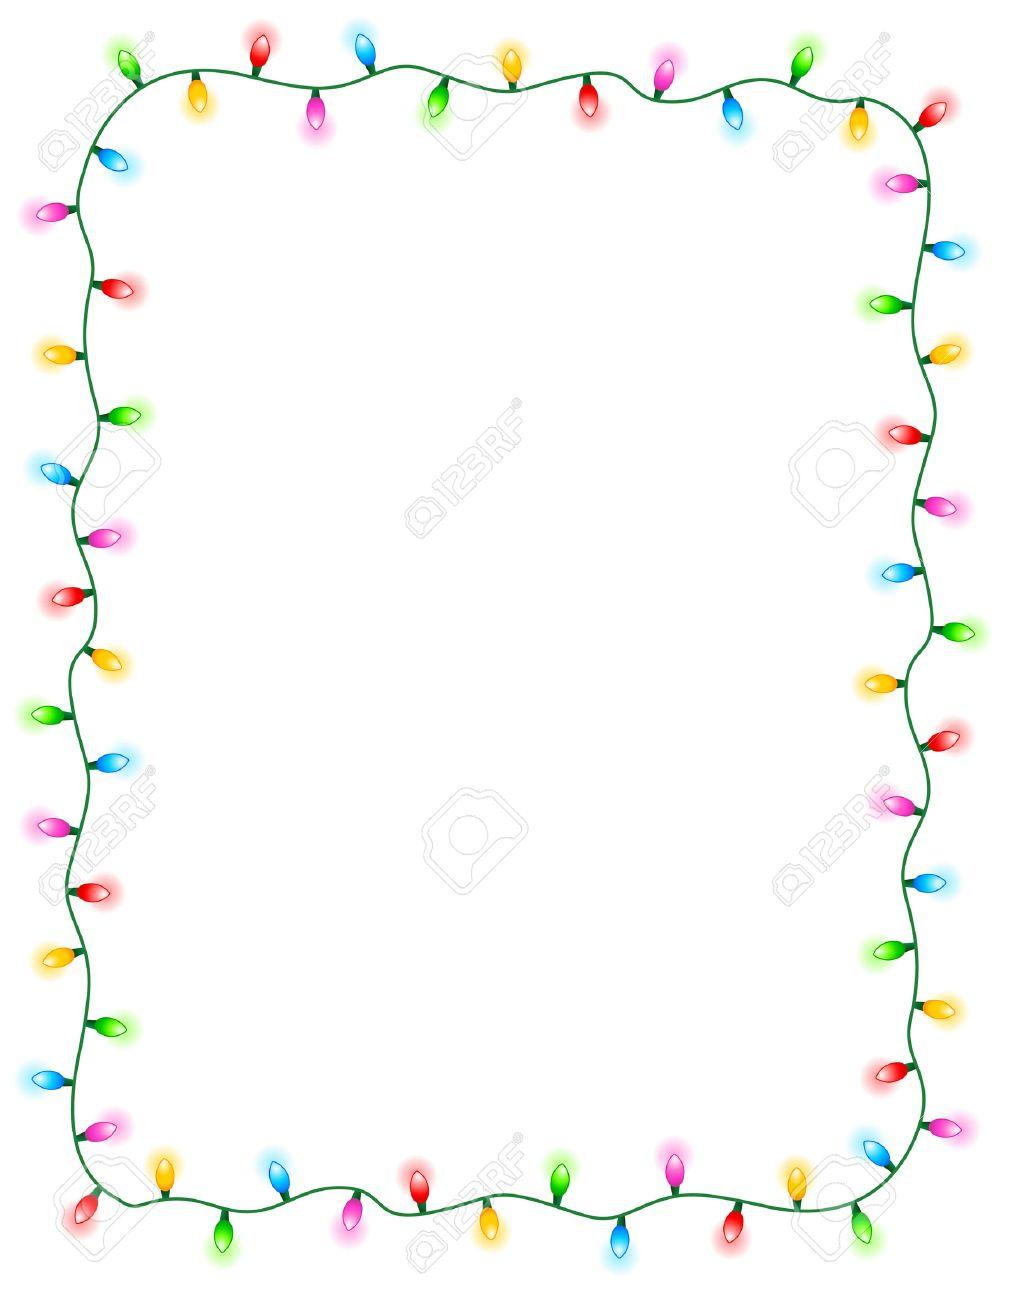 Christmas lights border - Colorful Glowing Christmas Lights Border Frame Colorful Holiday Lights Illustration Stock Vector 38748261